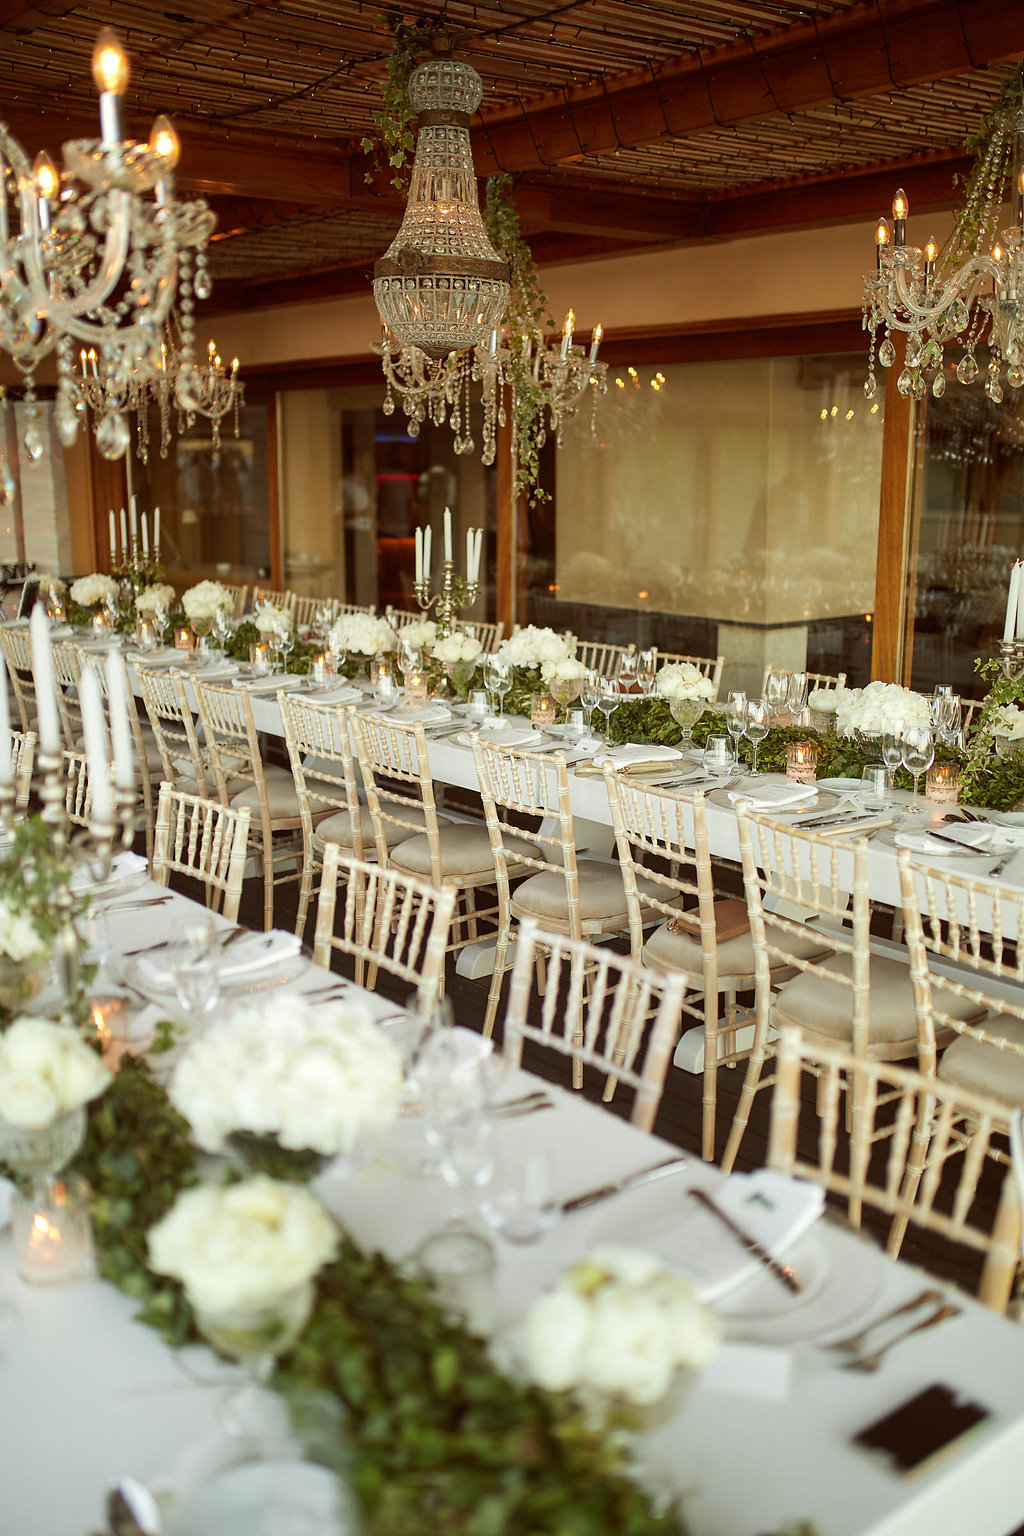 romantic wedding tables - photo by Sotiris Tsakanikas https://ruffledblog.com/chic-sunset-wedding-on-the-athens-riviera